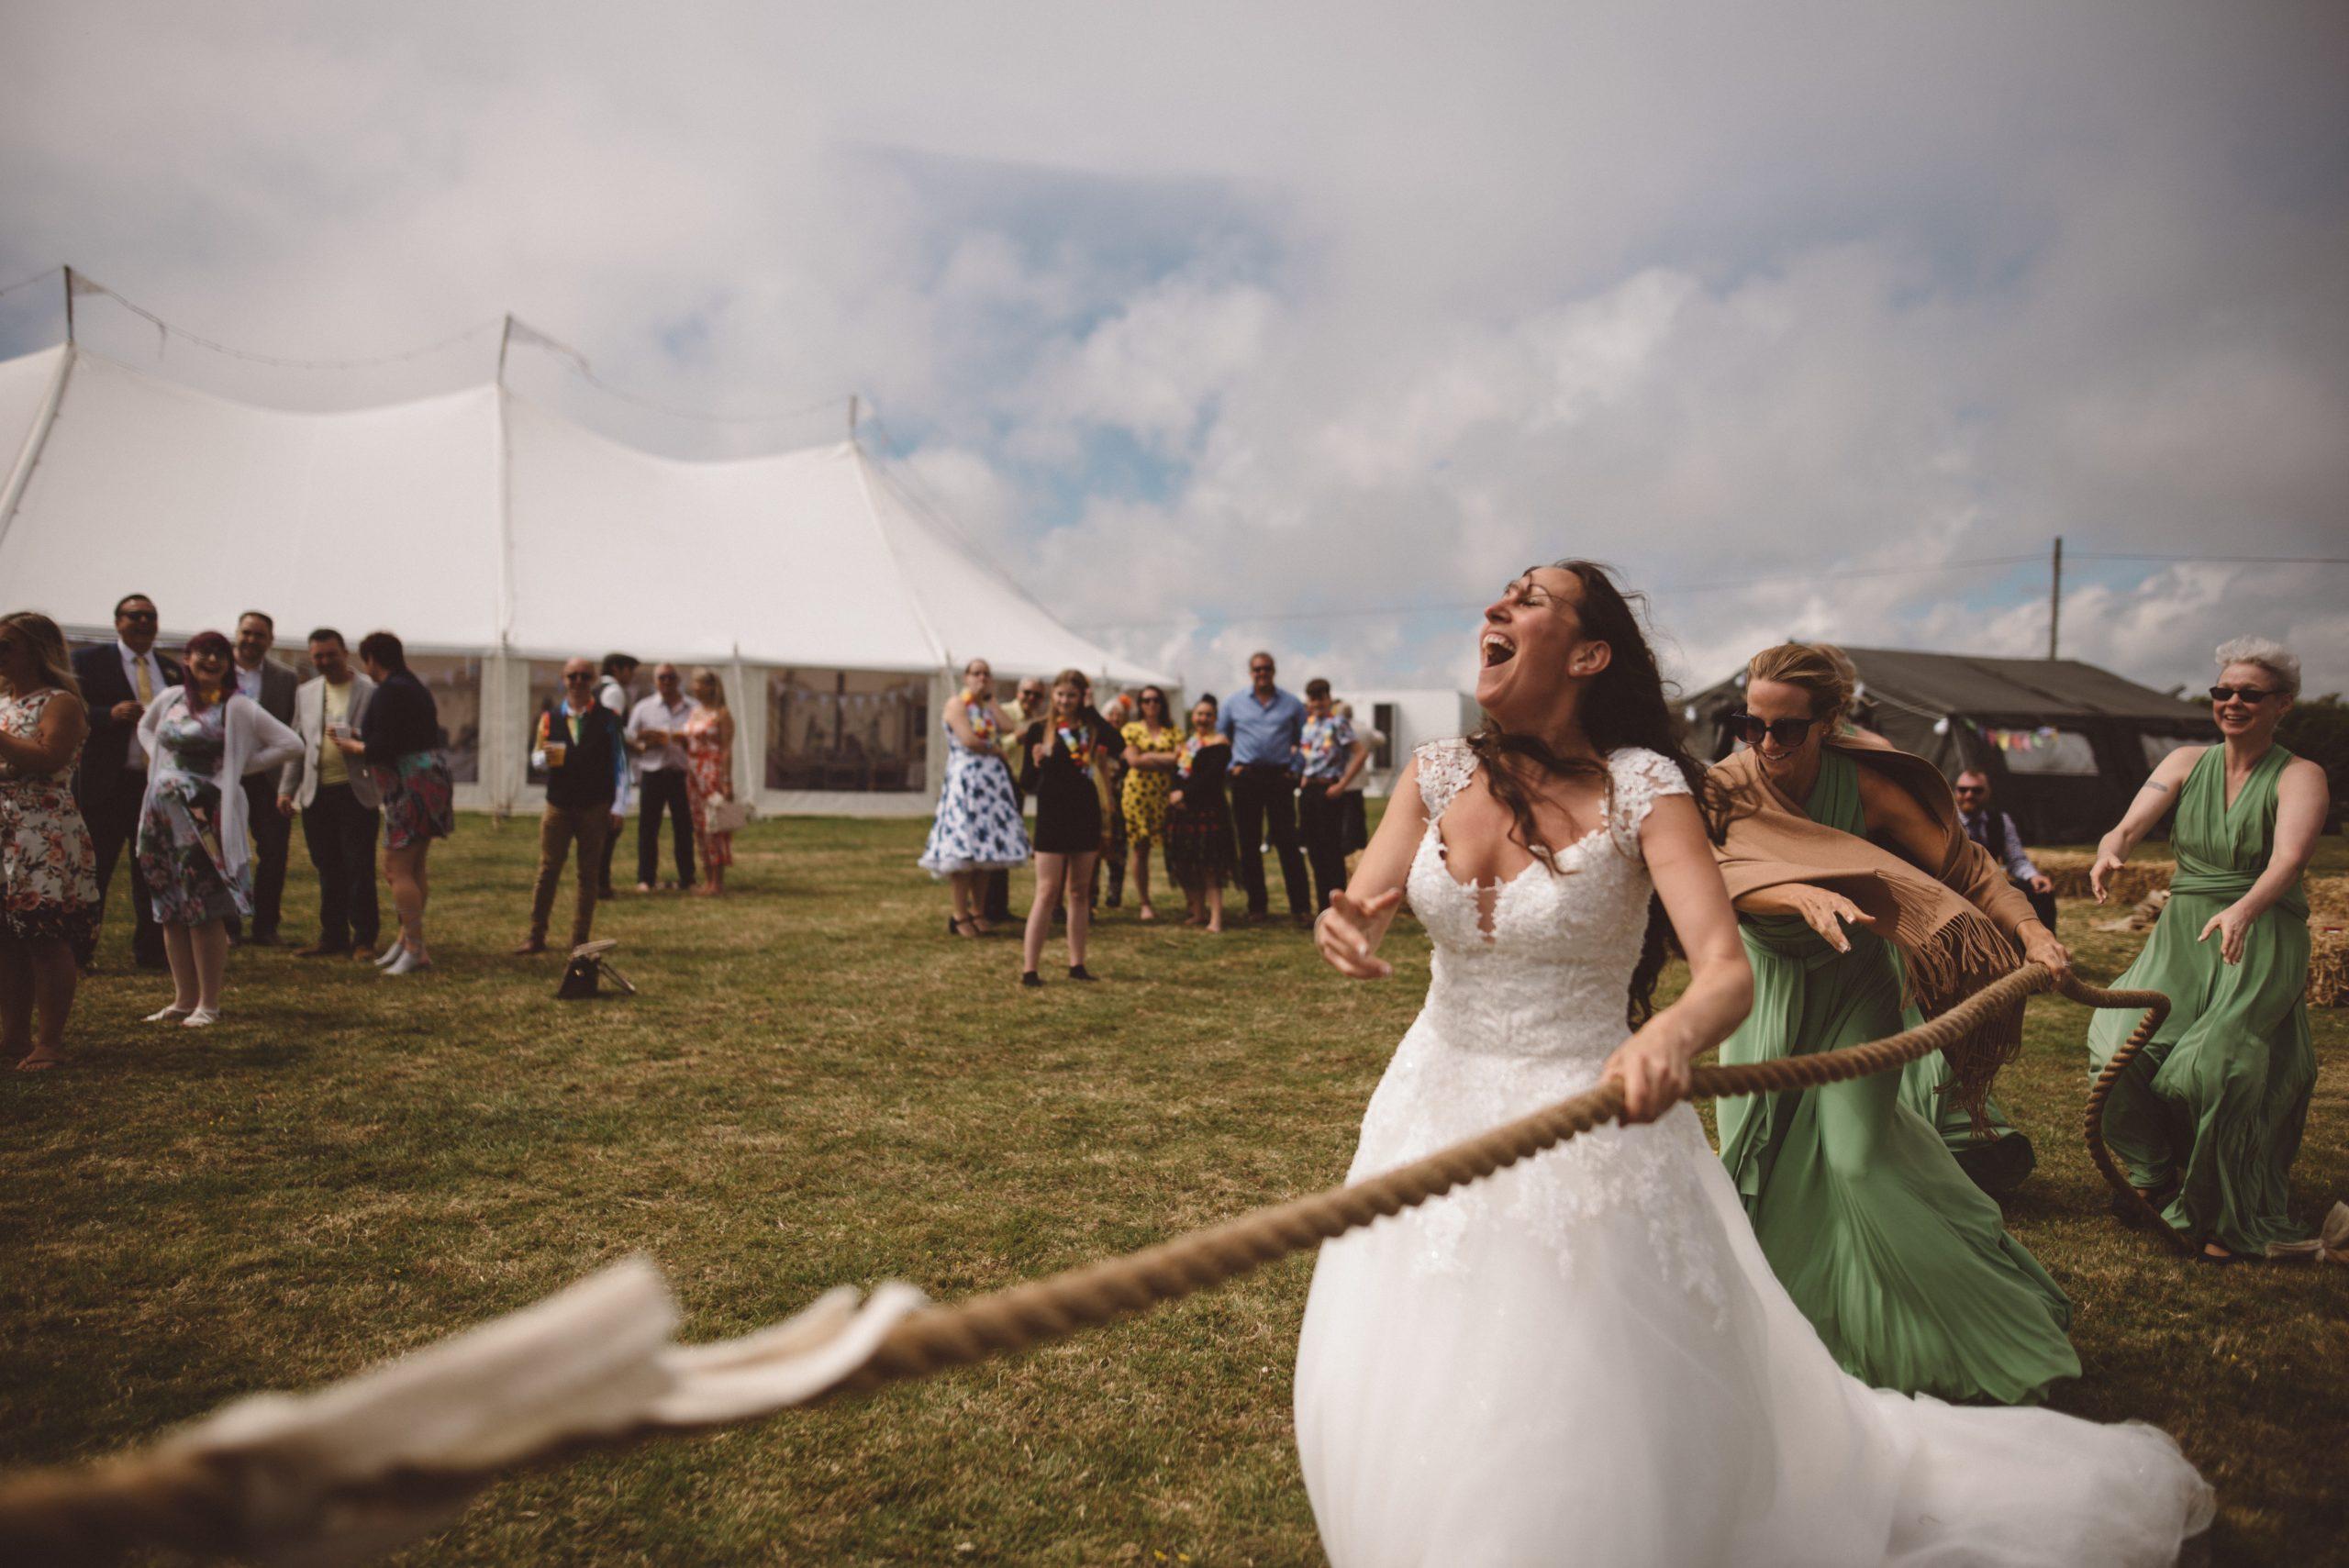 fun tug of war wedding games at Carswell Weddings